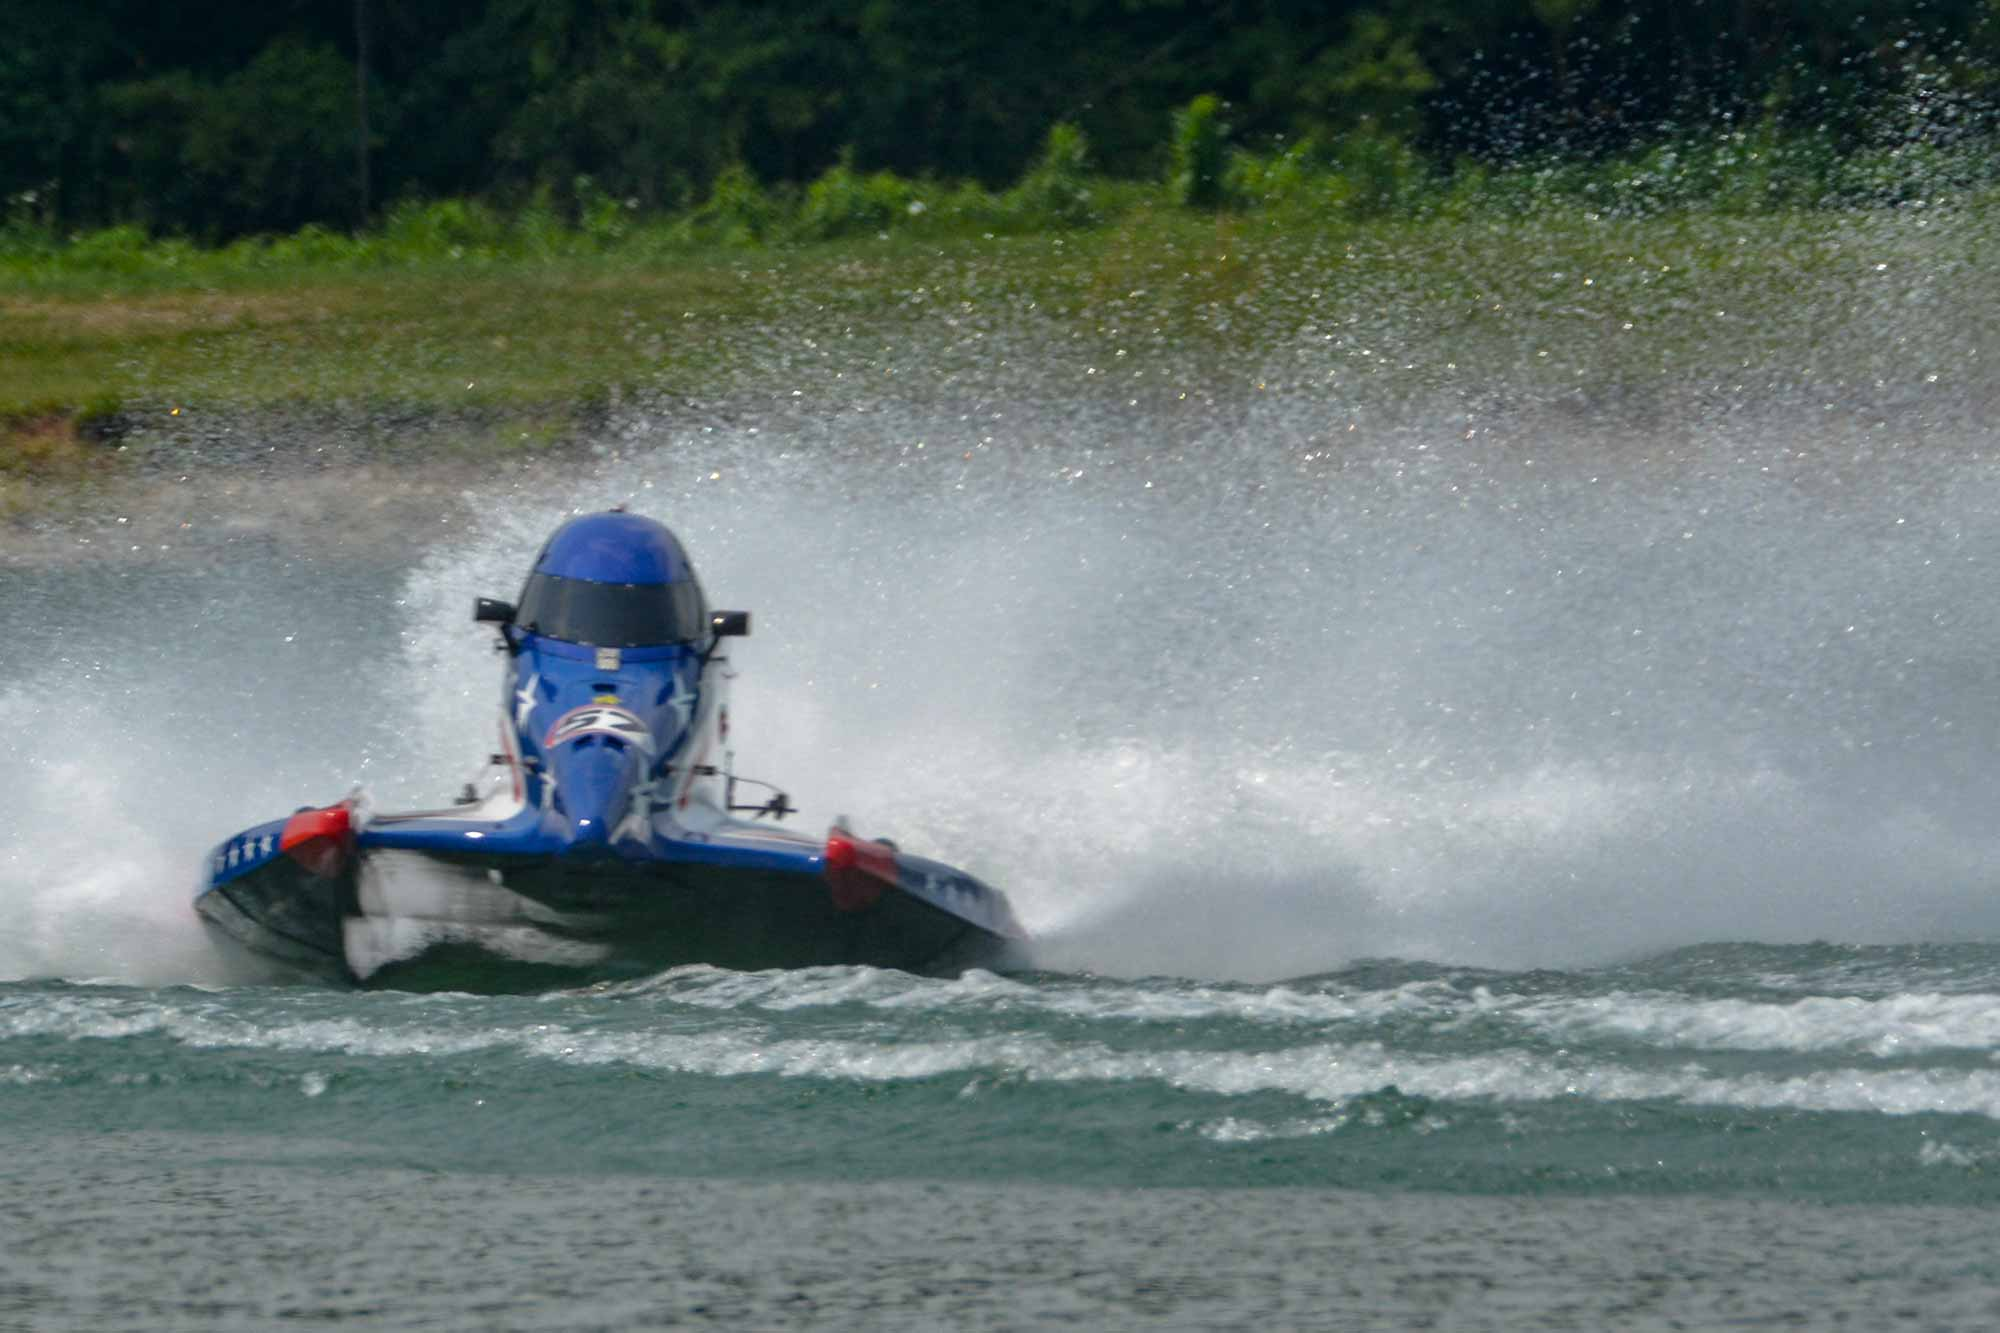 McMurray-Racing-Nashvill-Marine-2021-Springfield-F1-Race-6